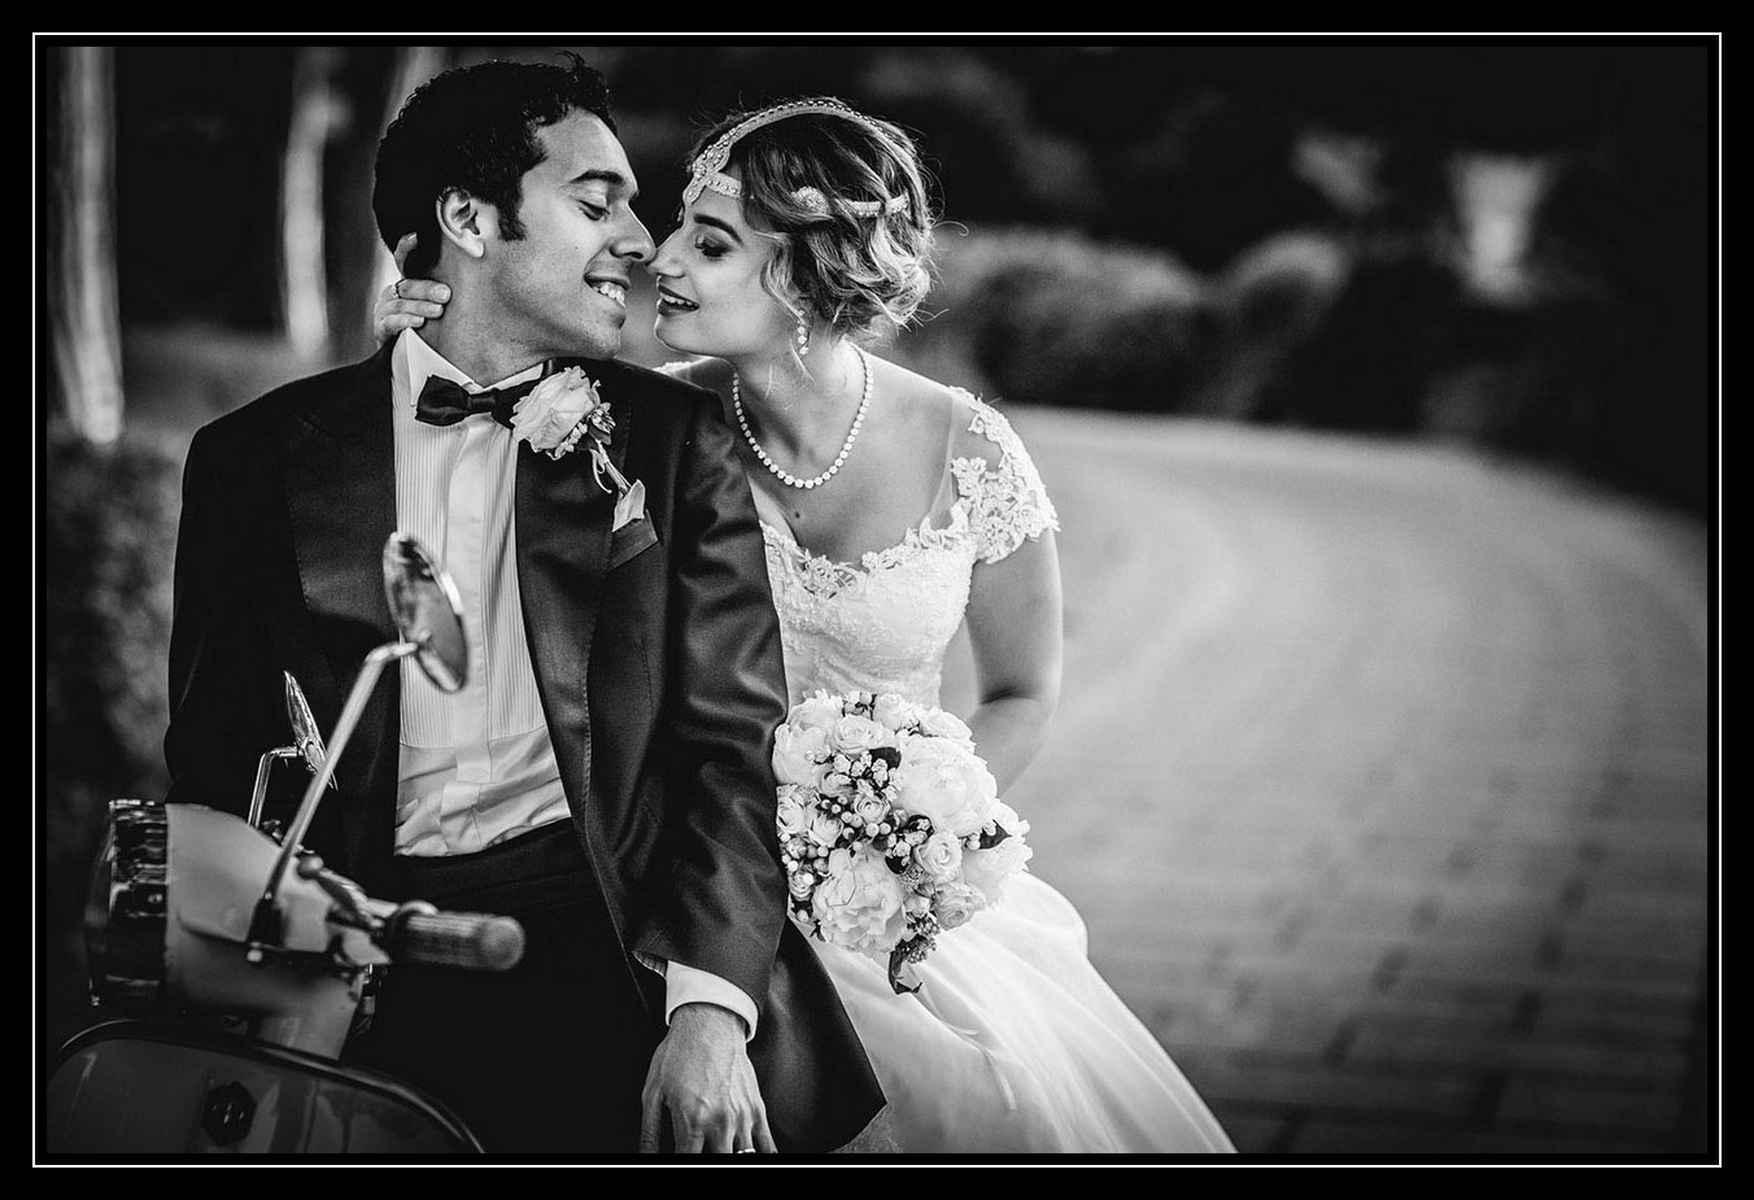 Mariage en scooter